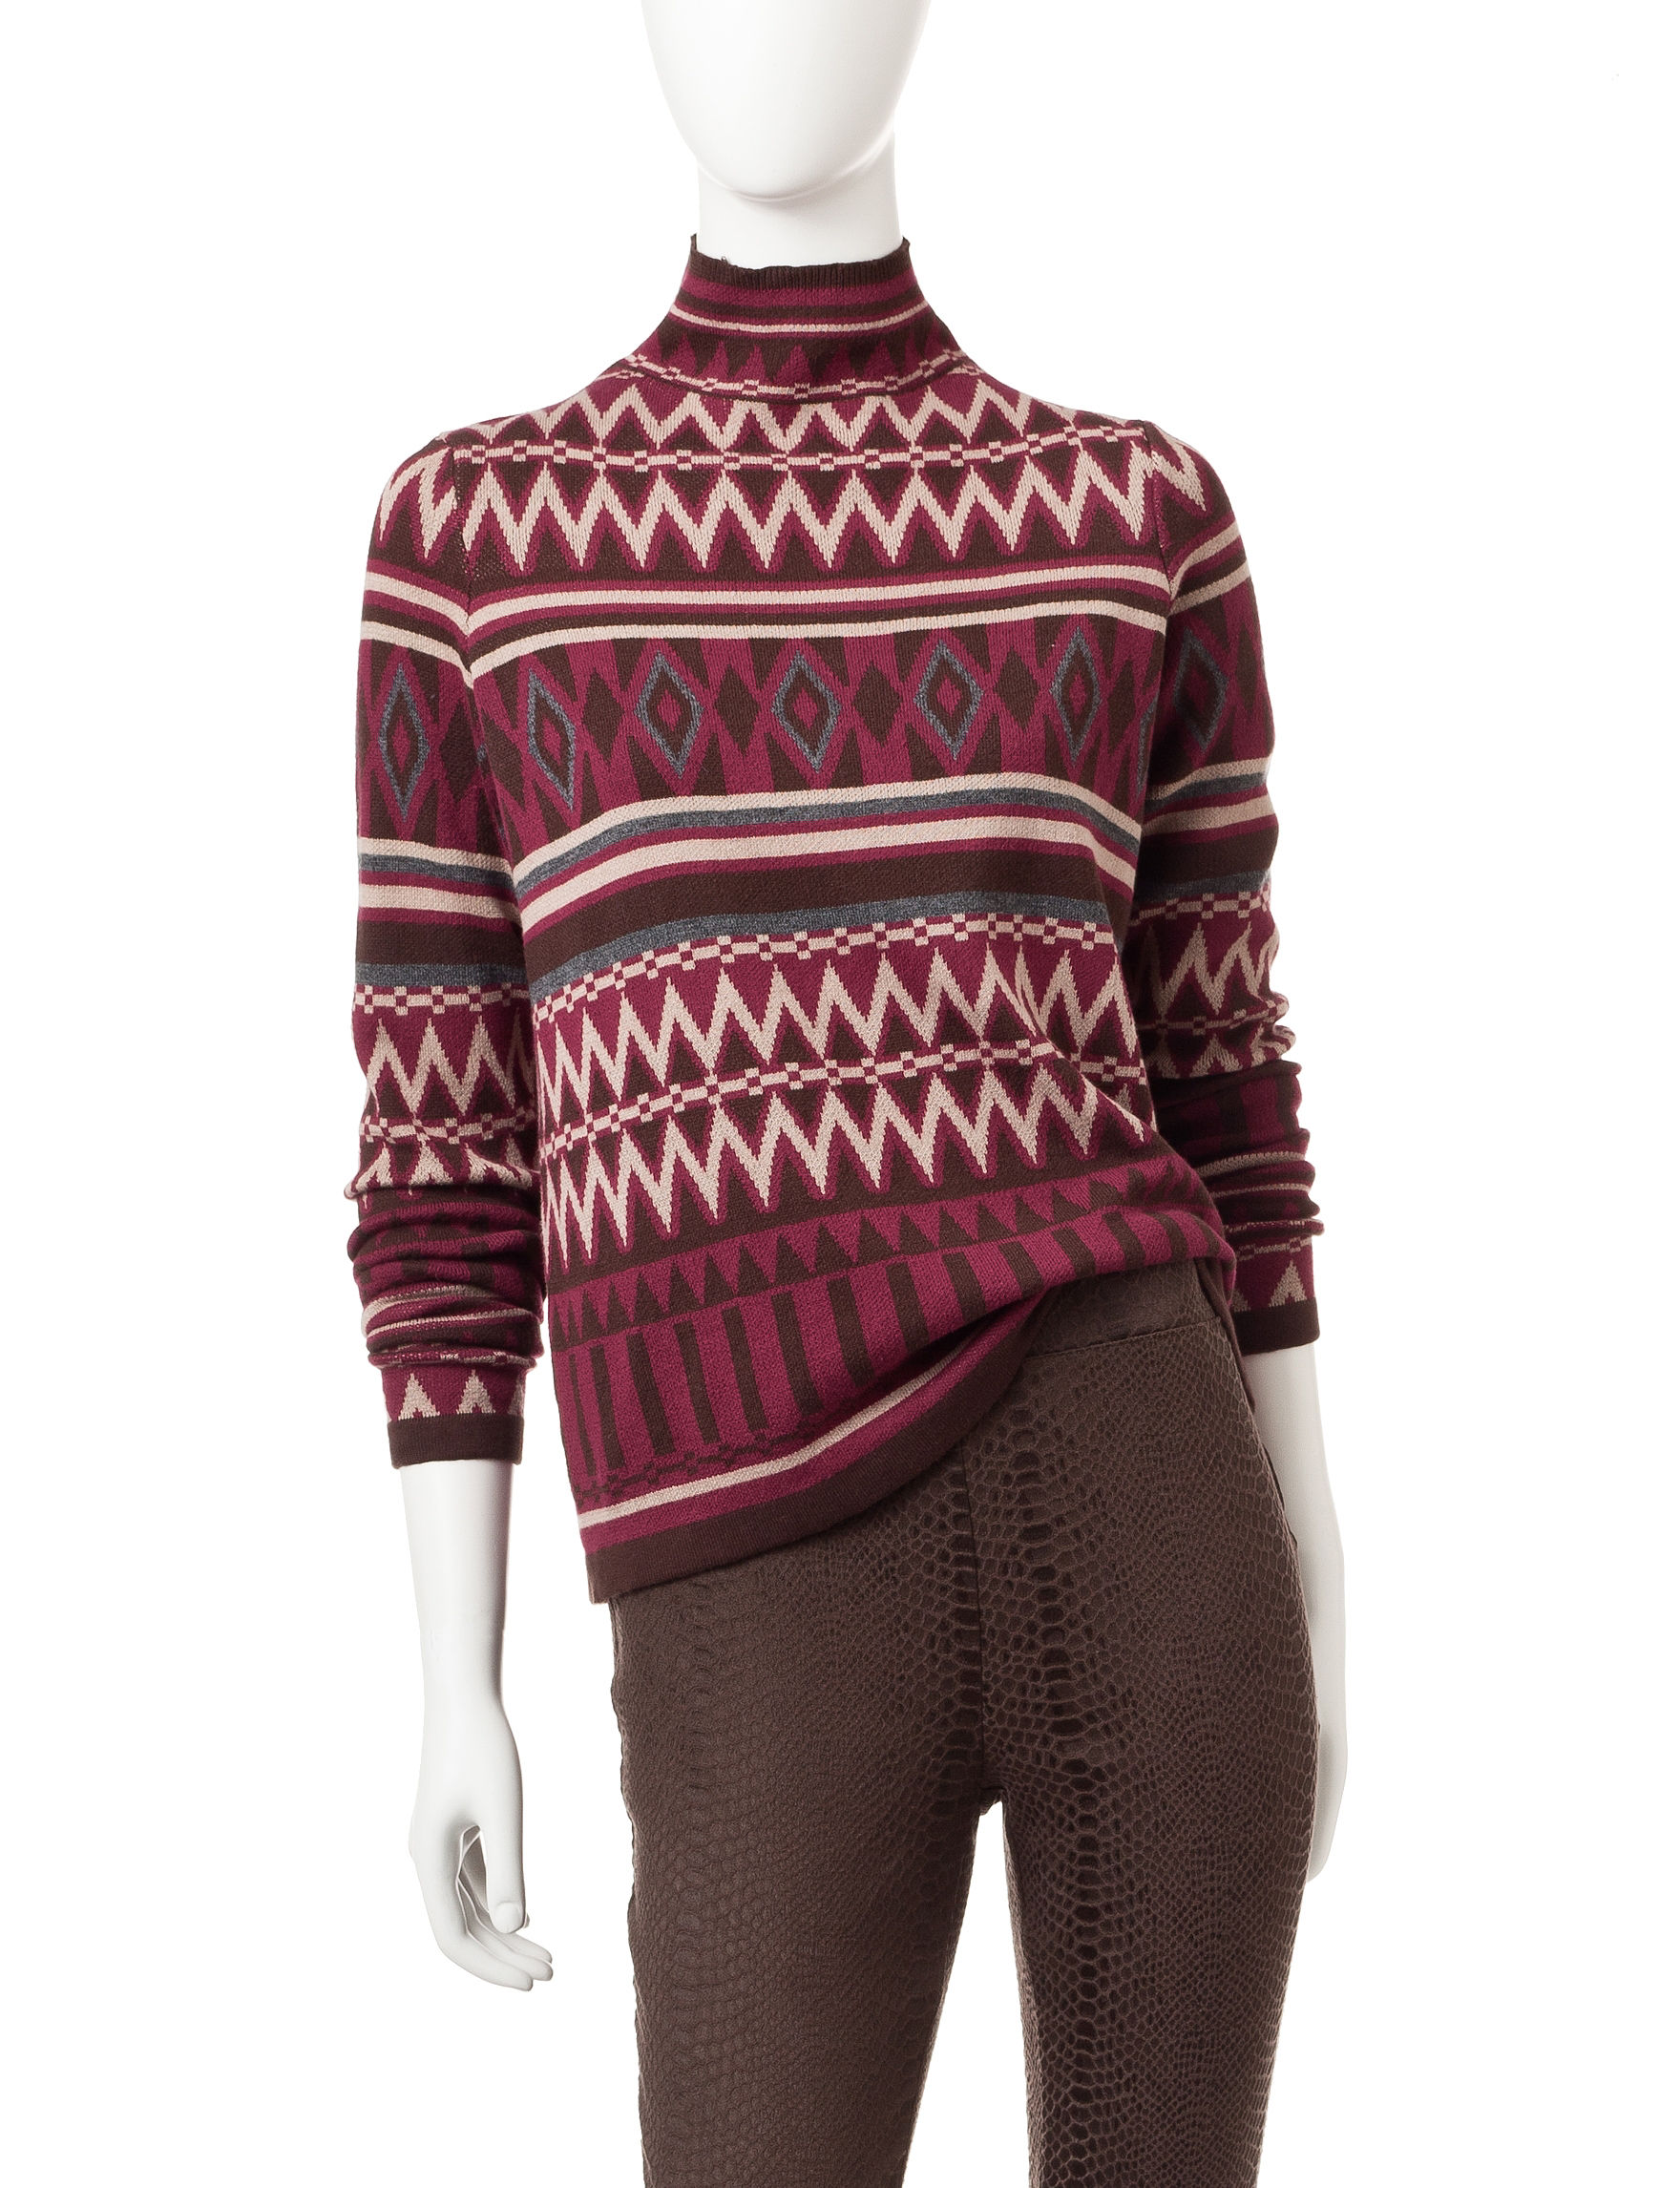 Romeo + Juliet Couture Burgundy Multi Sweaters